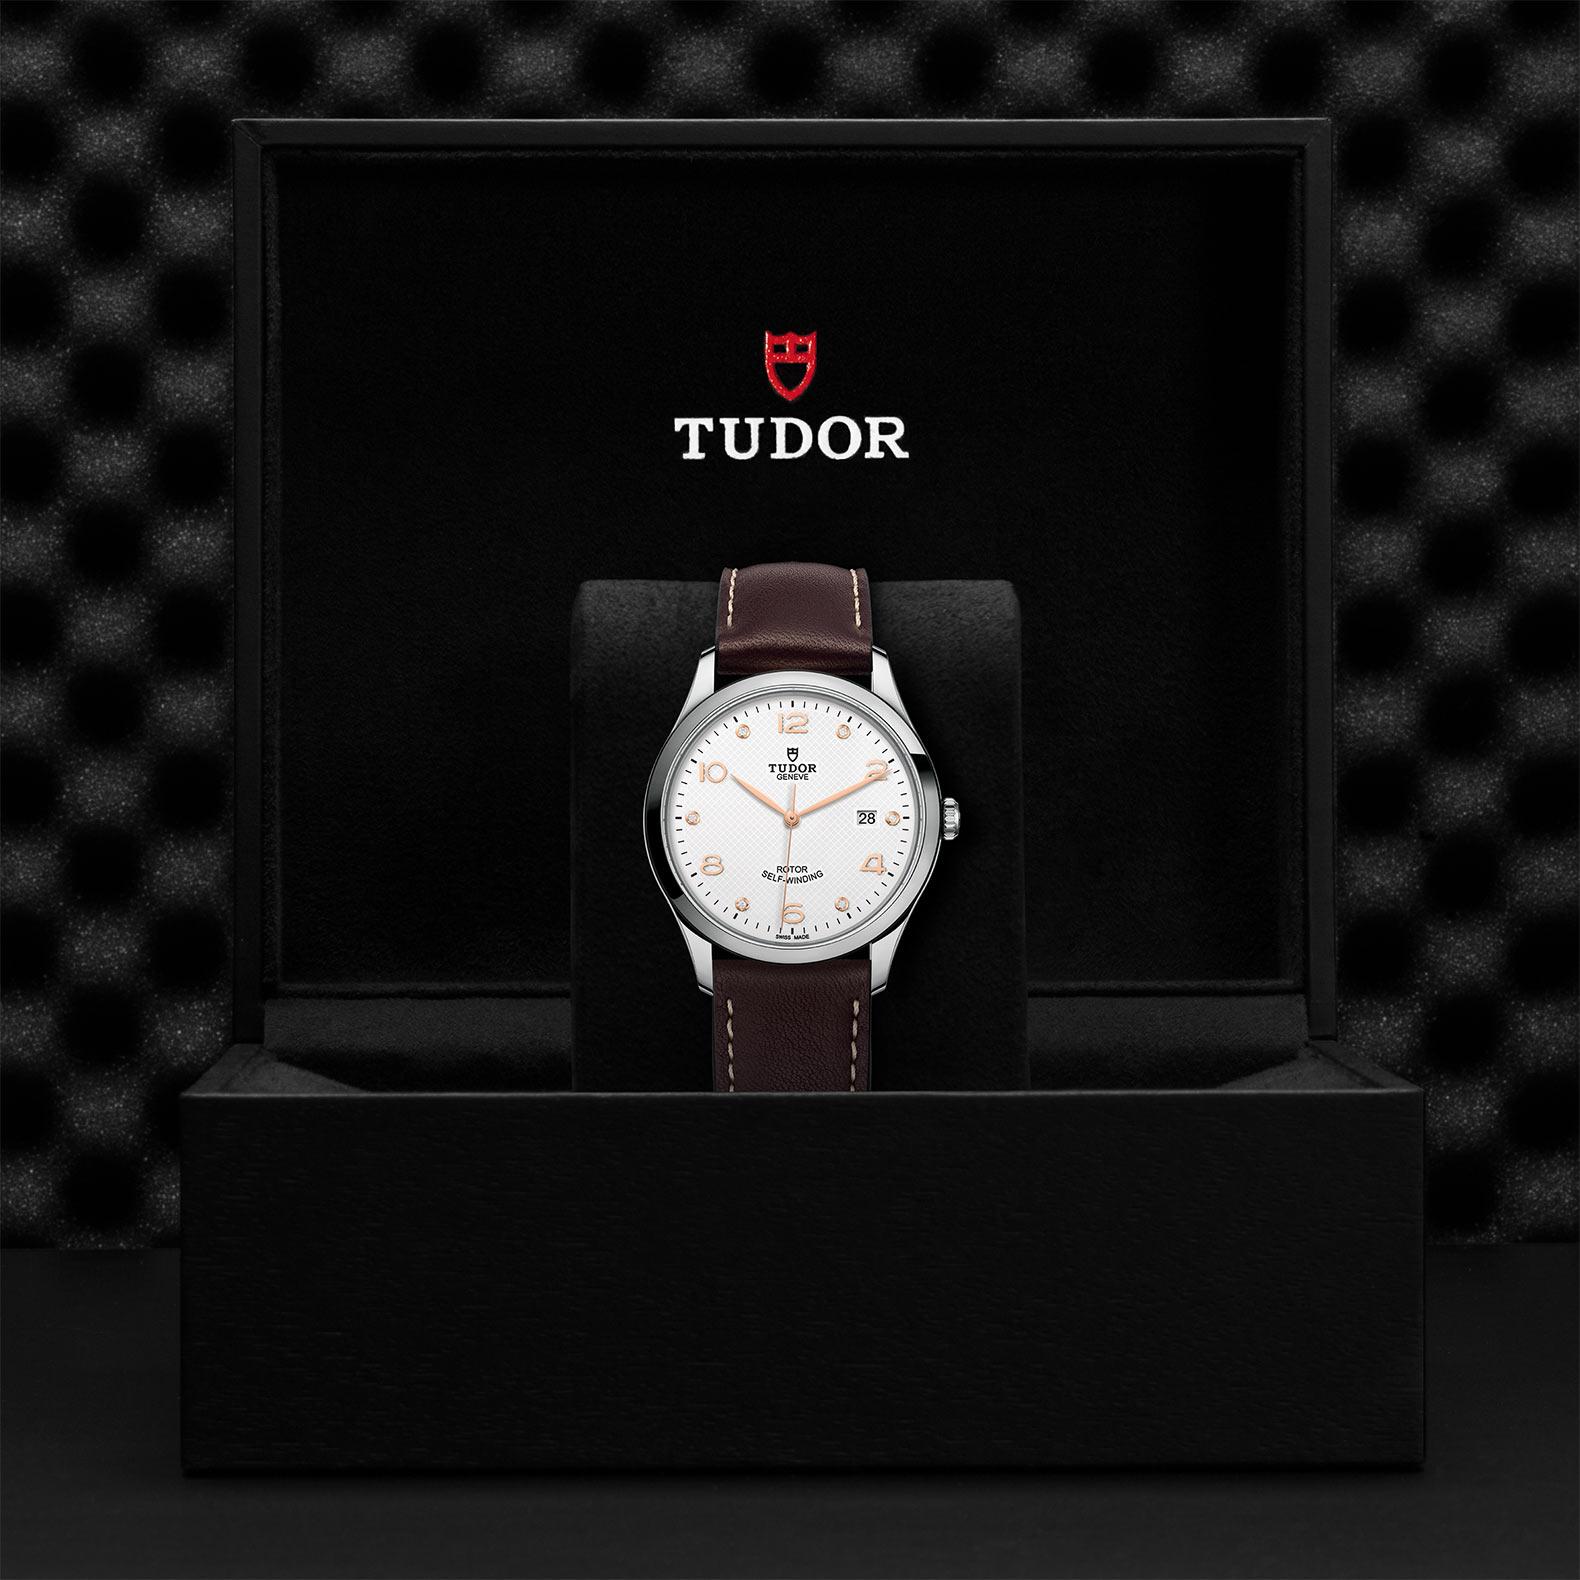 TUDOR 1926 - M91650-0014